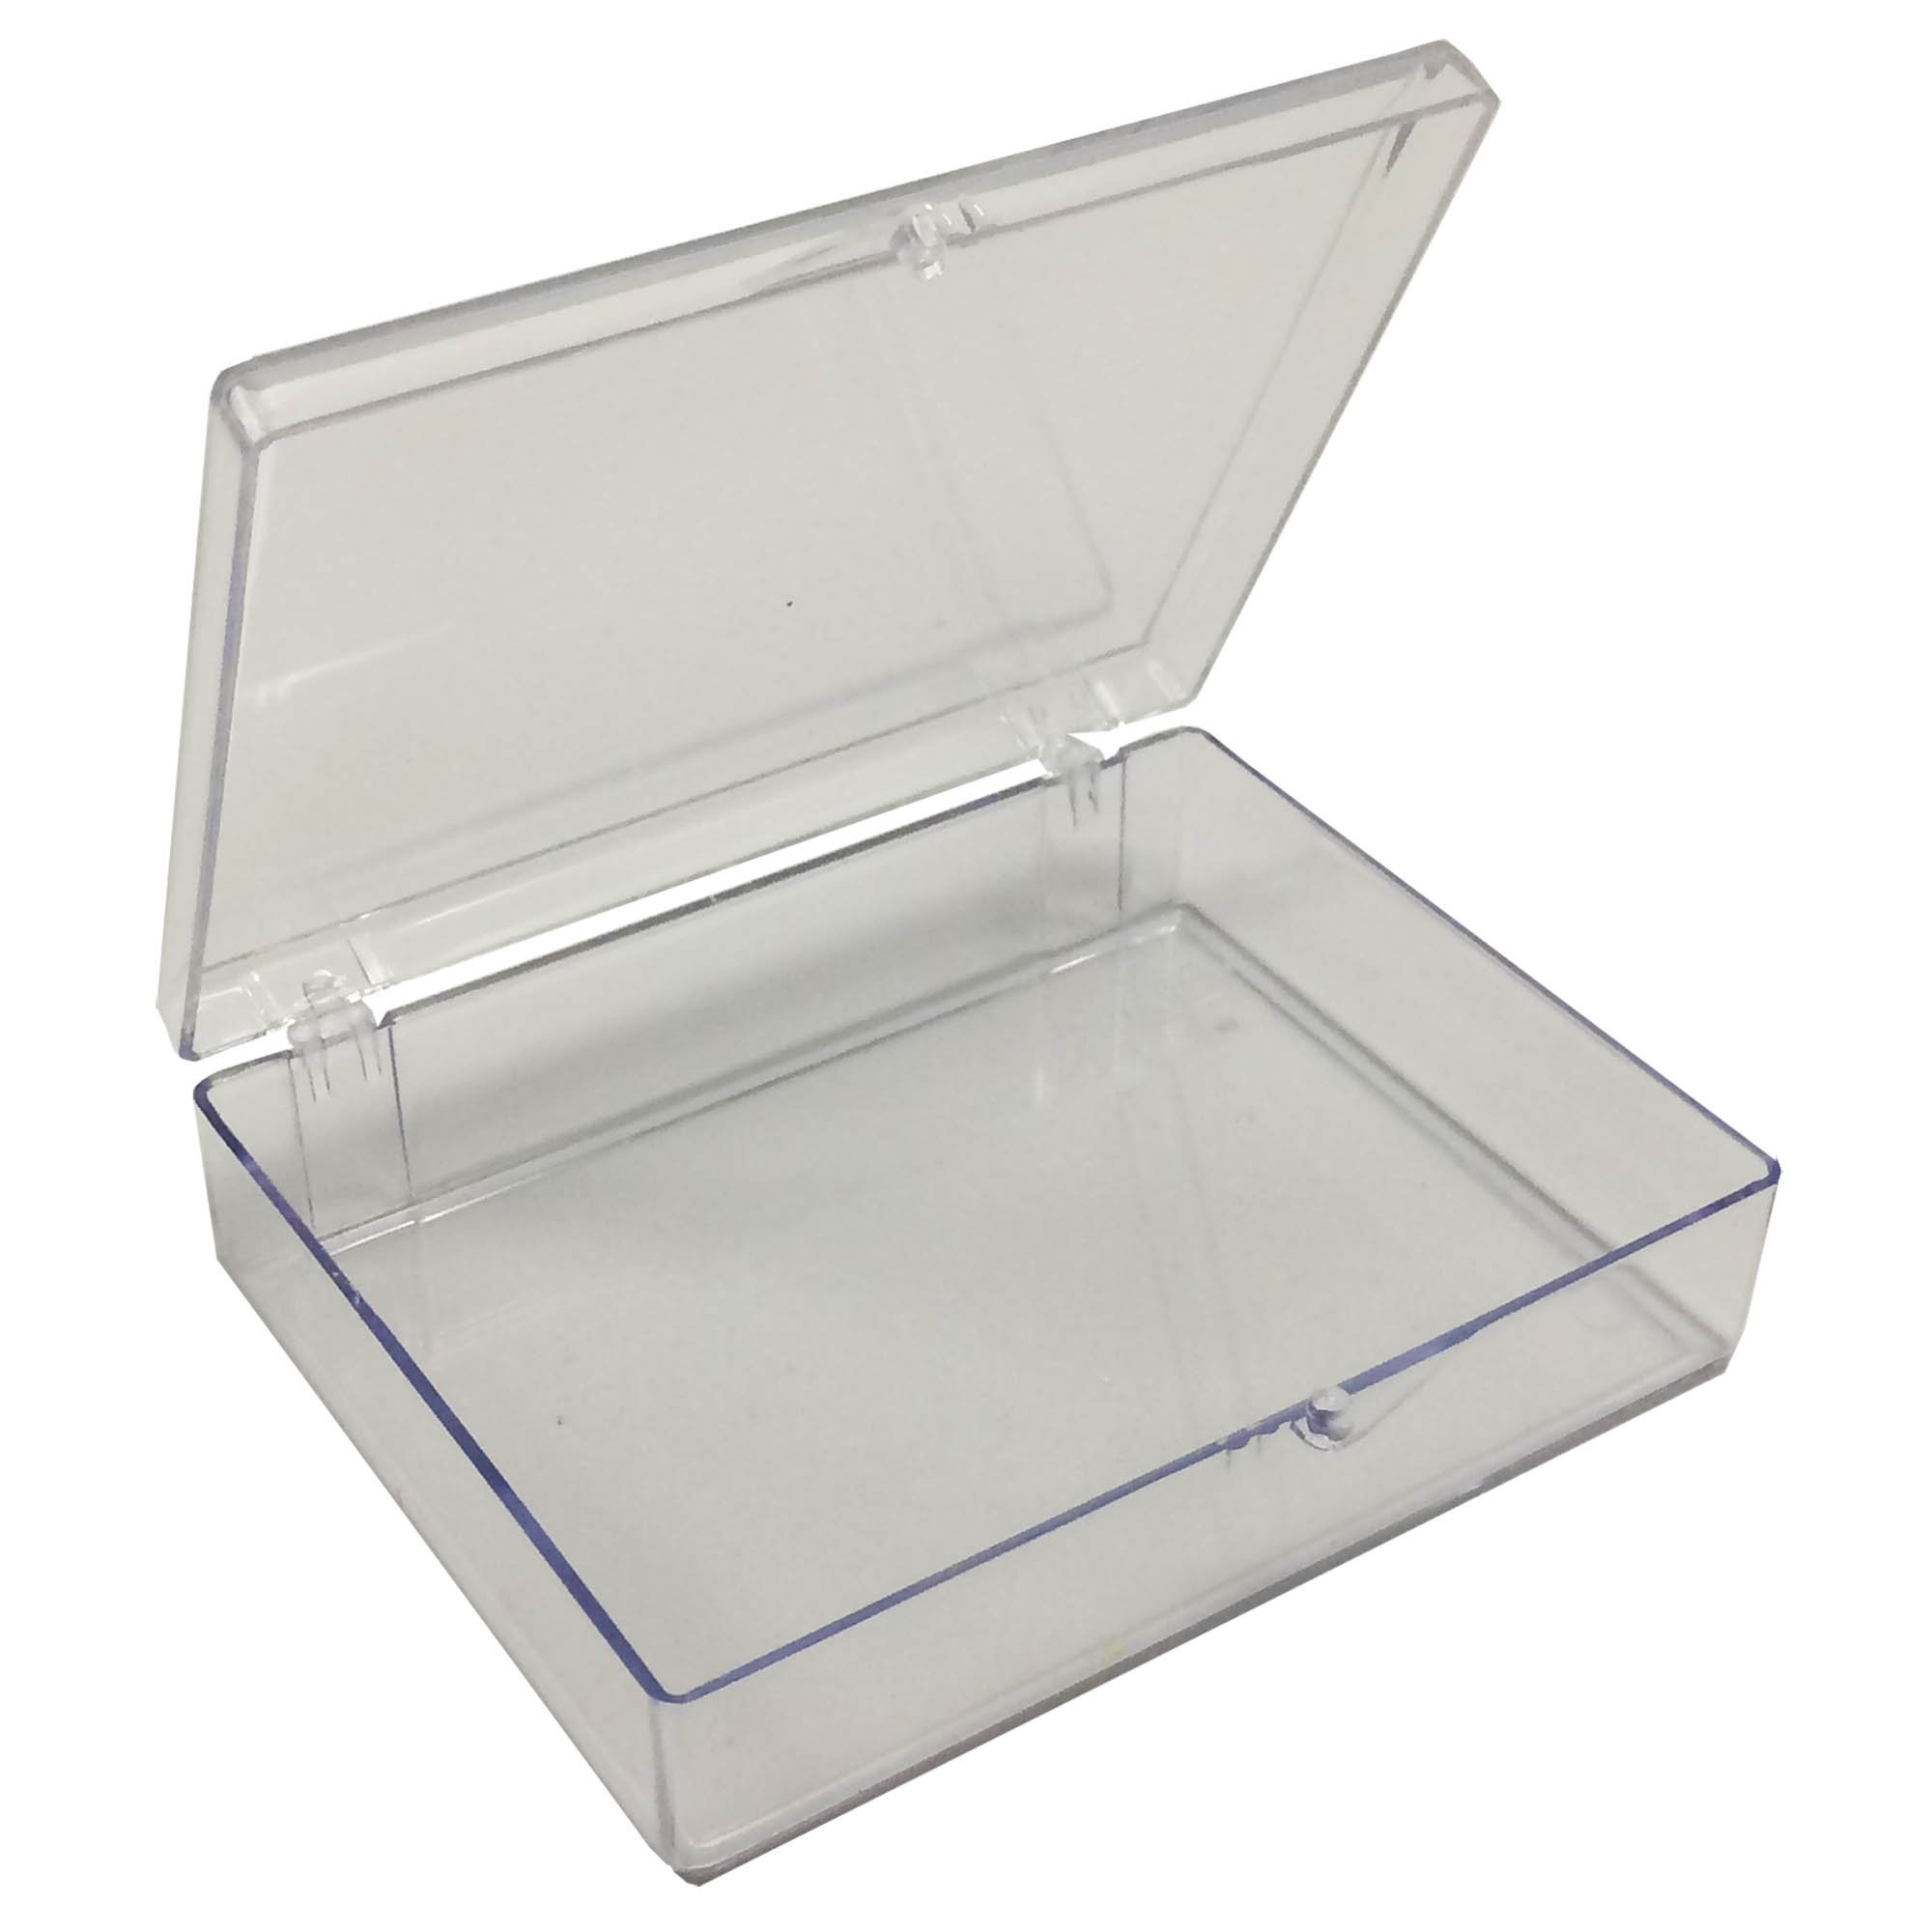 Large Clear Western Blot Box - 4 5/8